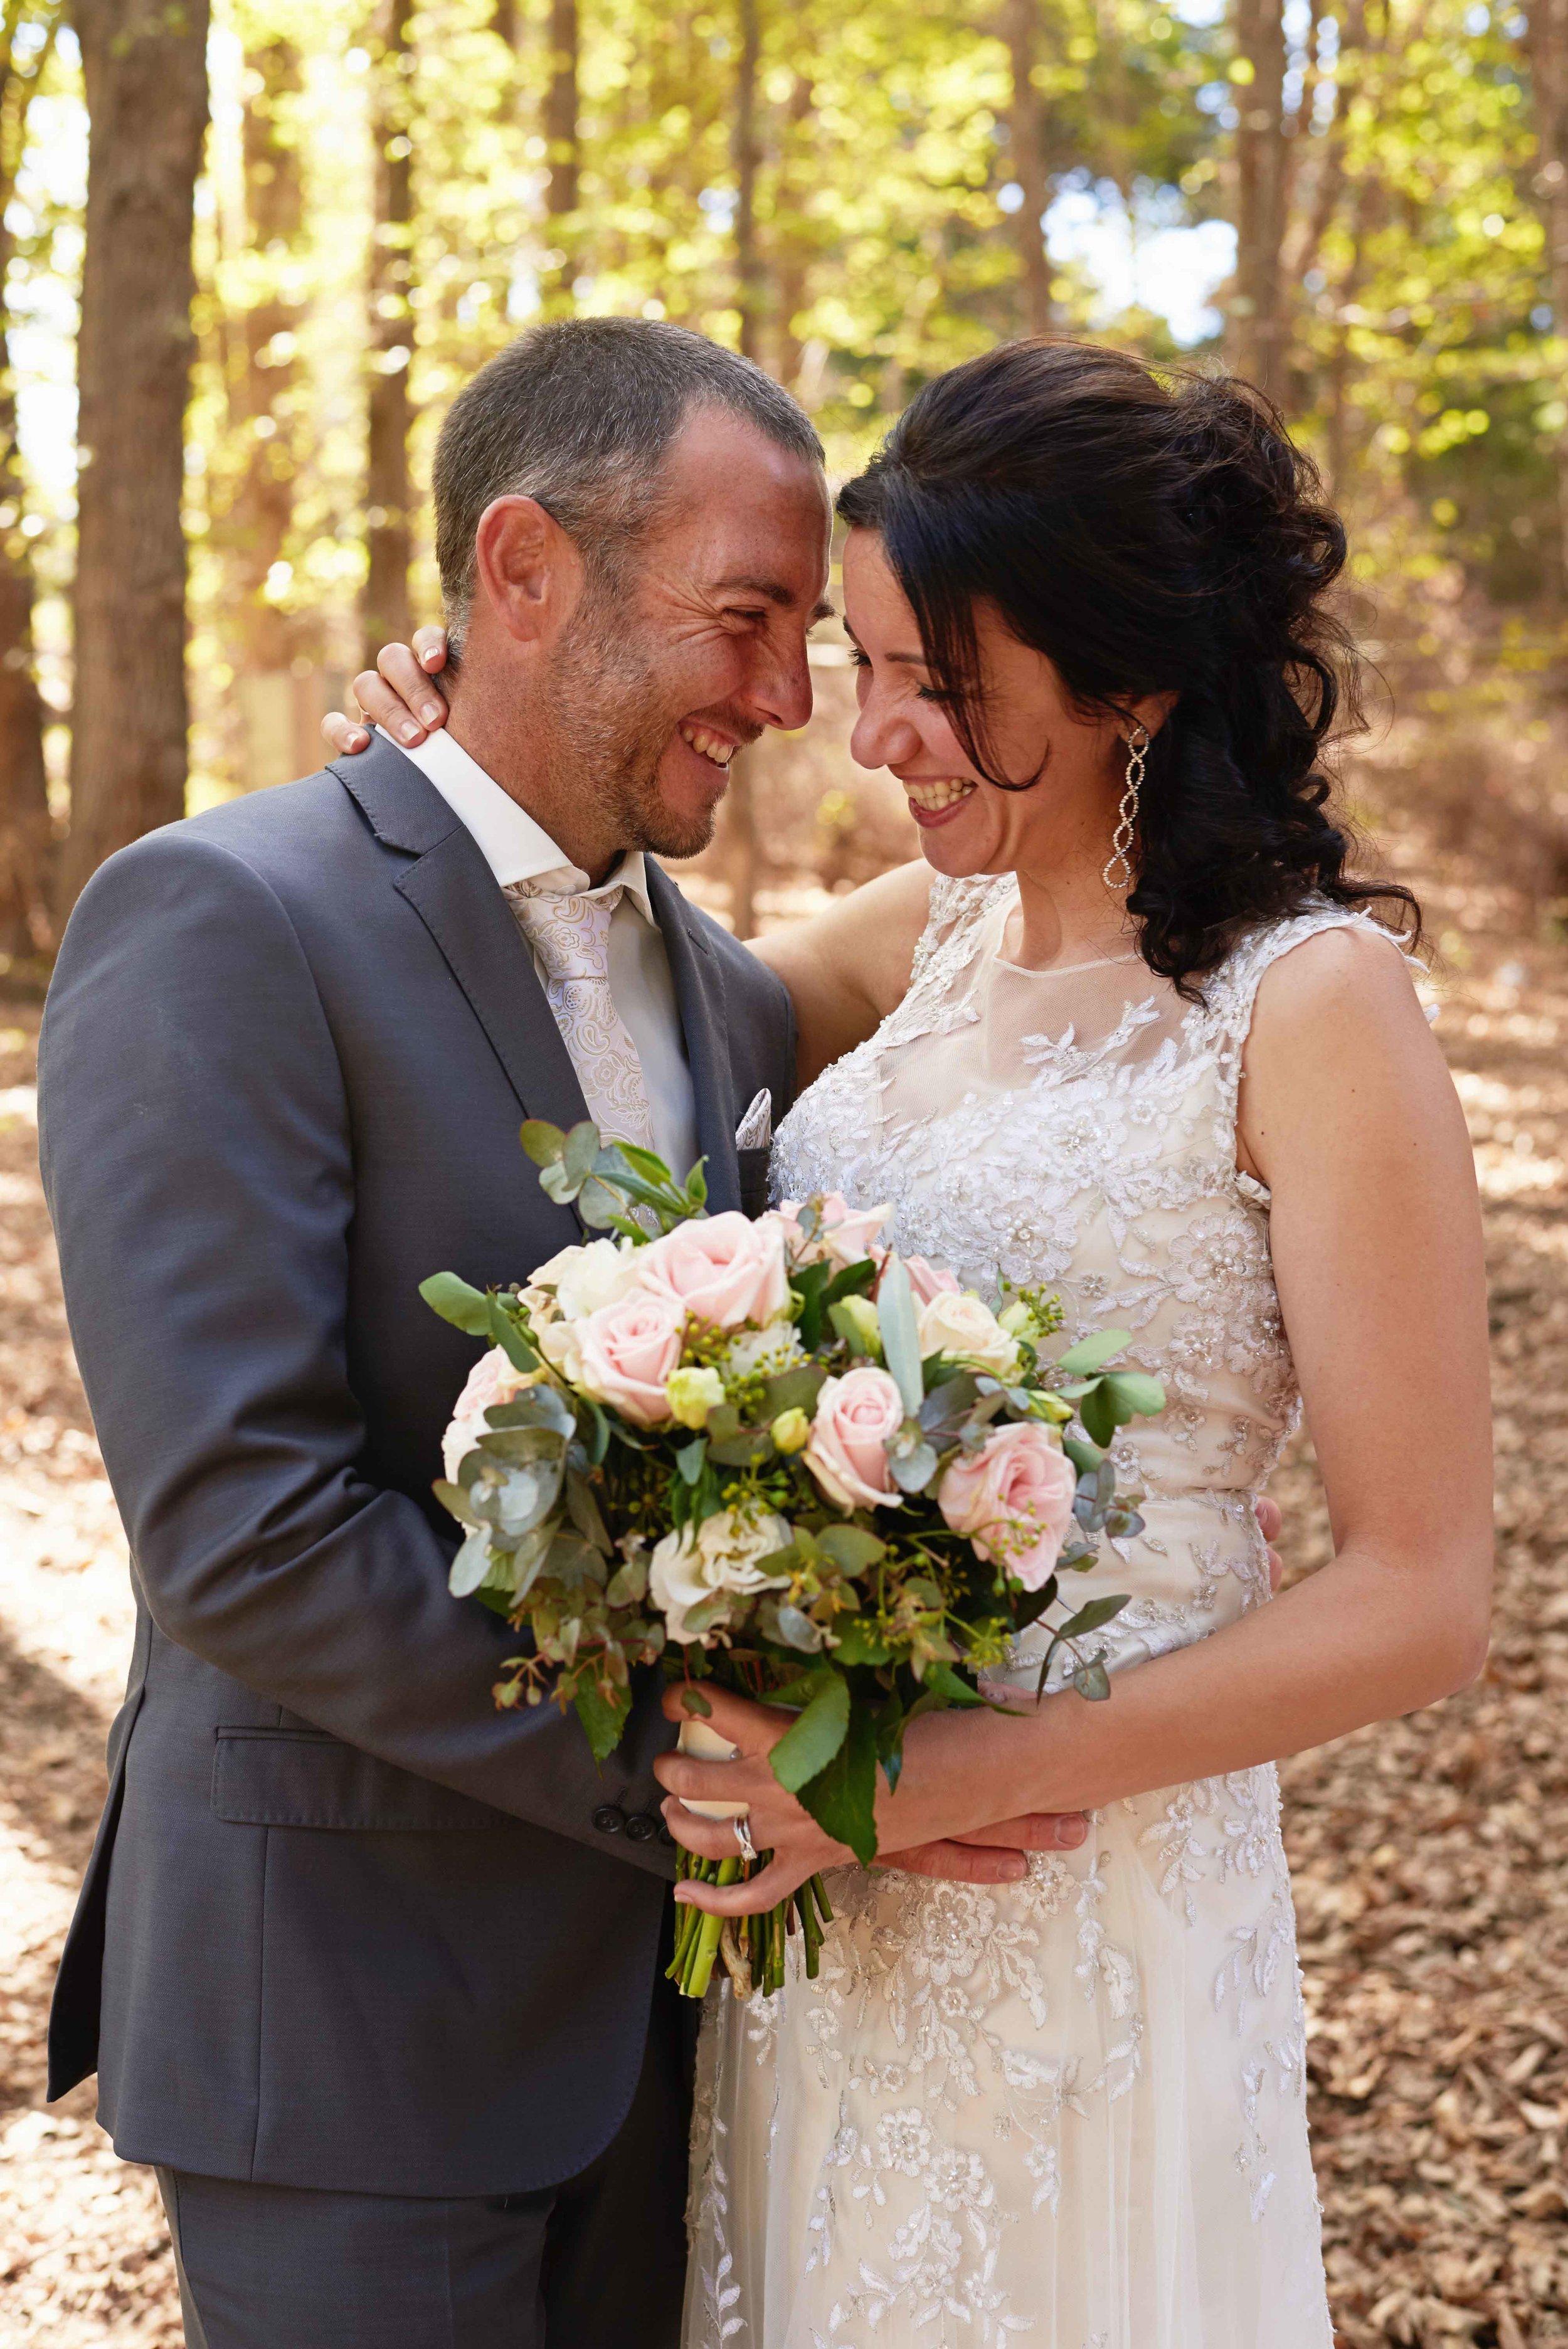 sorrento-wedding-photography-all-smiles-marissa-jade-photography-141.jpg